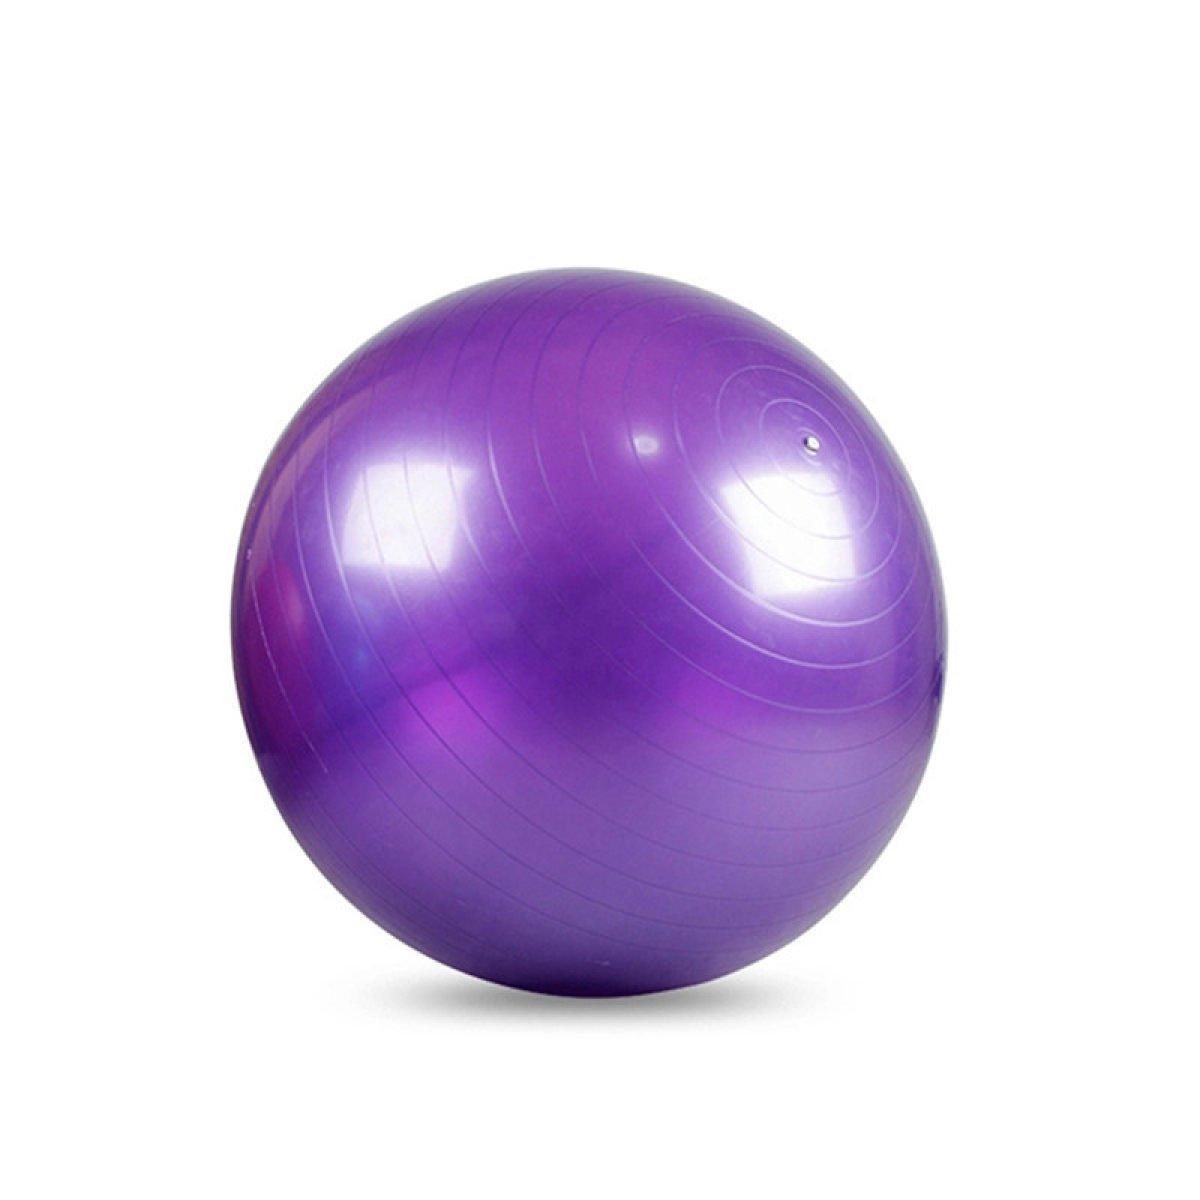 Thunfer Individueller Yoga Ball Explosion Massage Ball Fitness-Ball